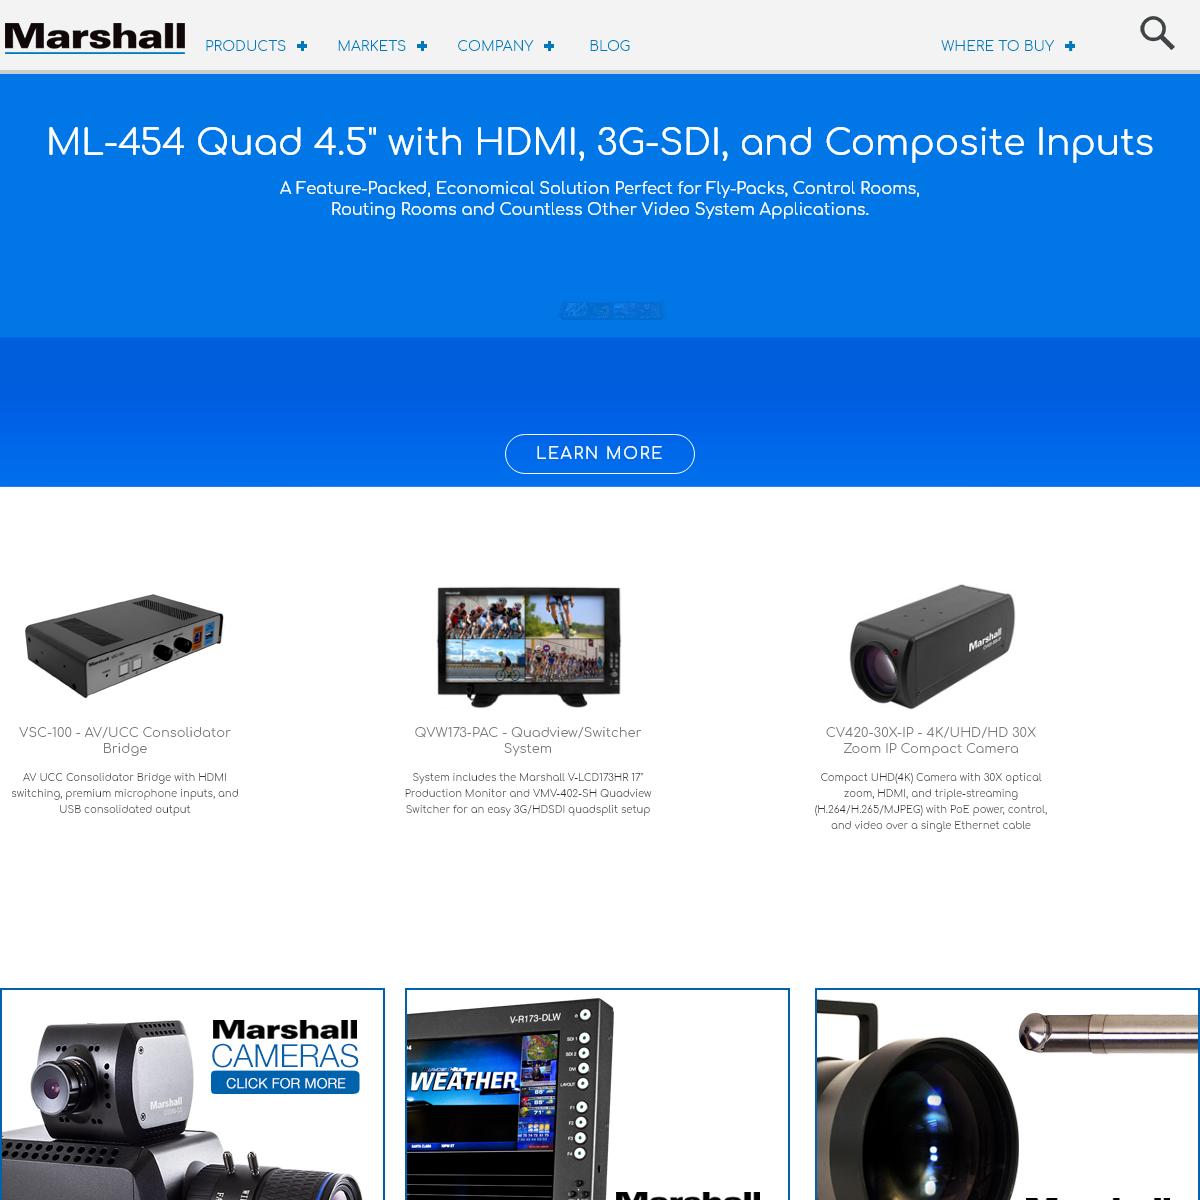 Marshall Electronics - Professional Broadcast Miniature-Compact-Indoor 4K-UHD-HD Cameras, 4K Rack Mount-Desktop Monitors, Hardwa